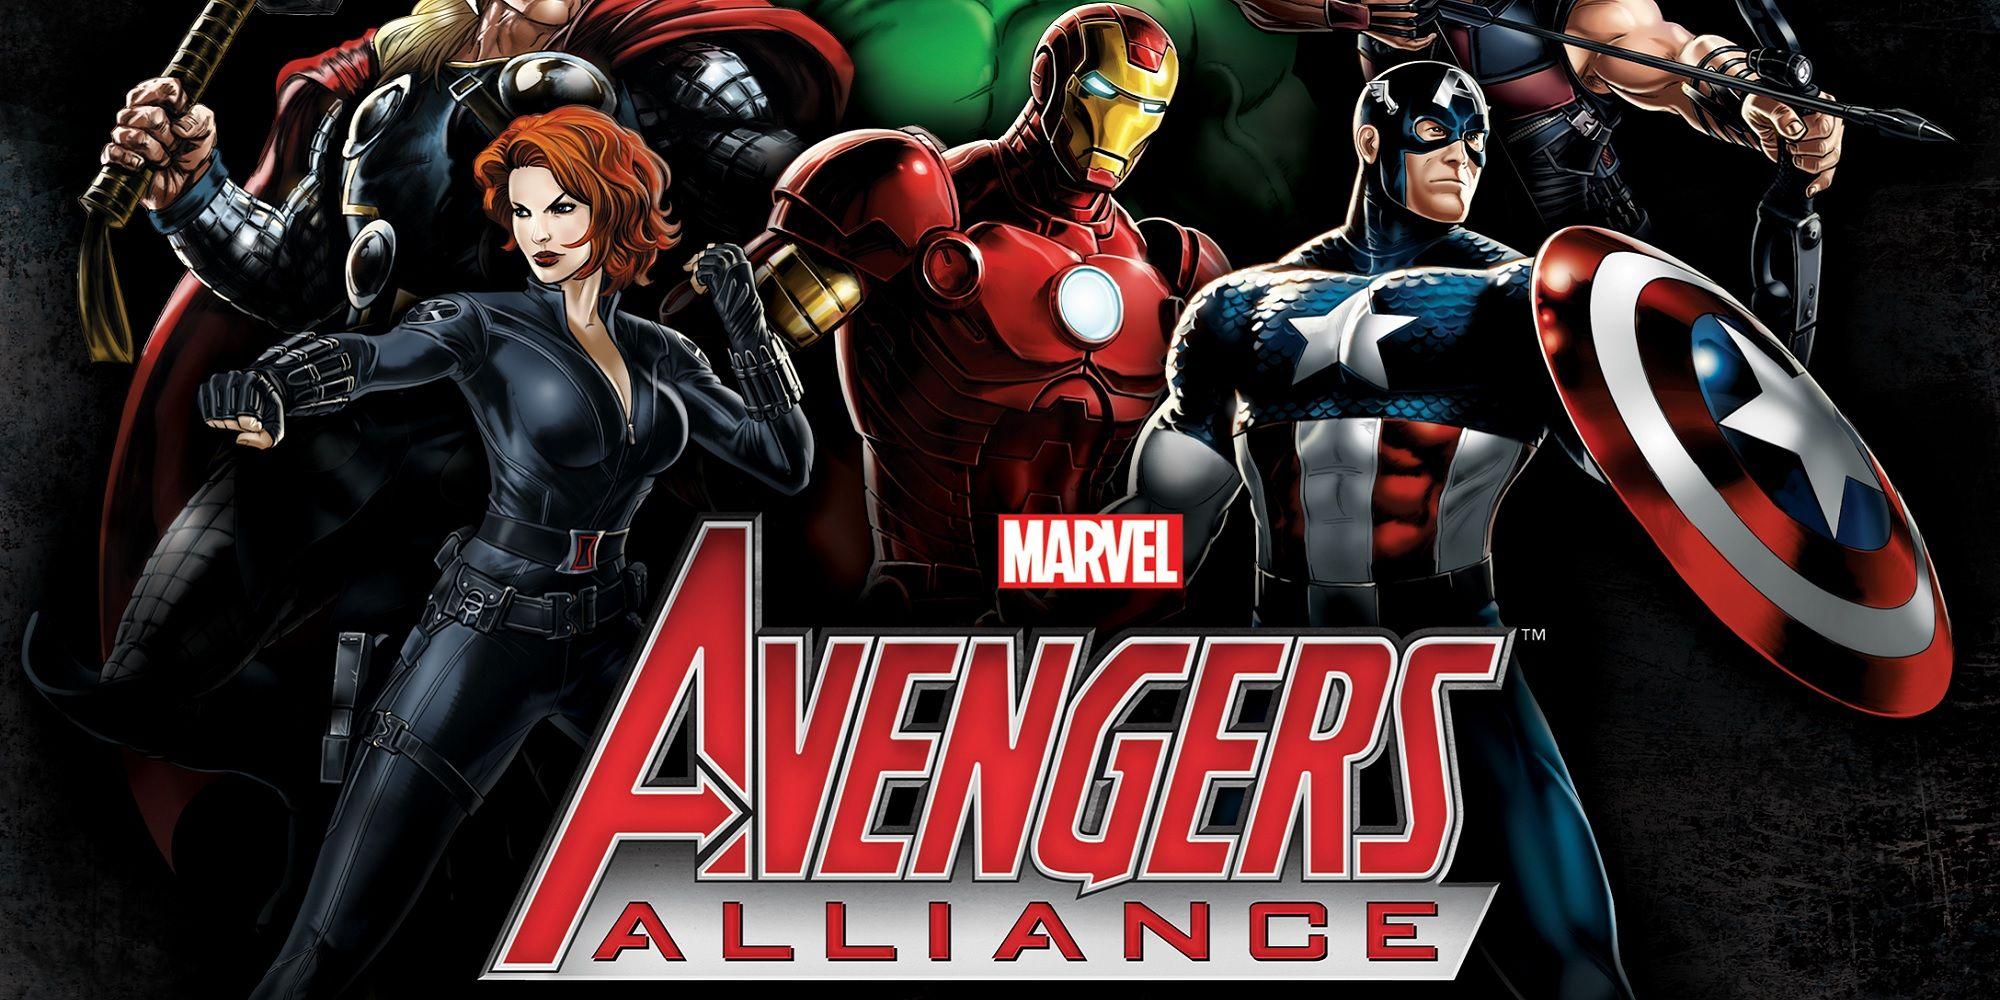 download game marvel avengers alliance offline for pc